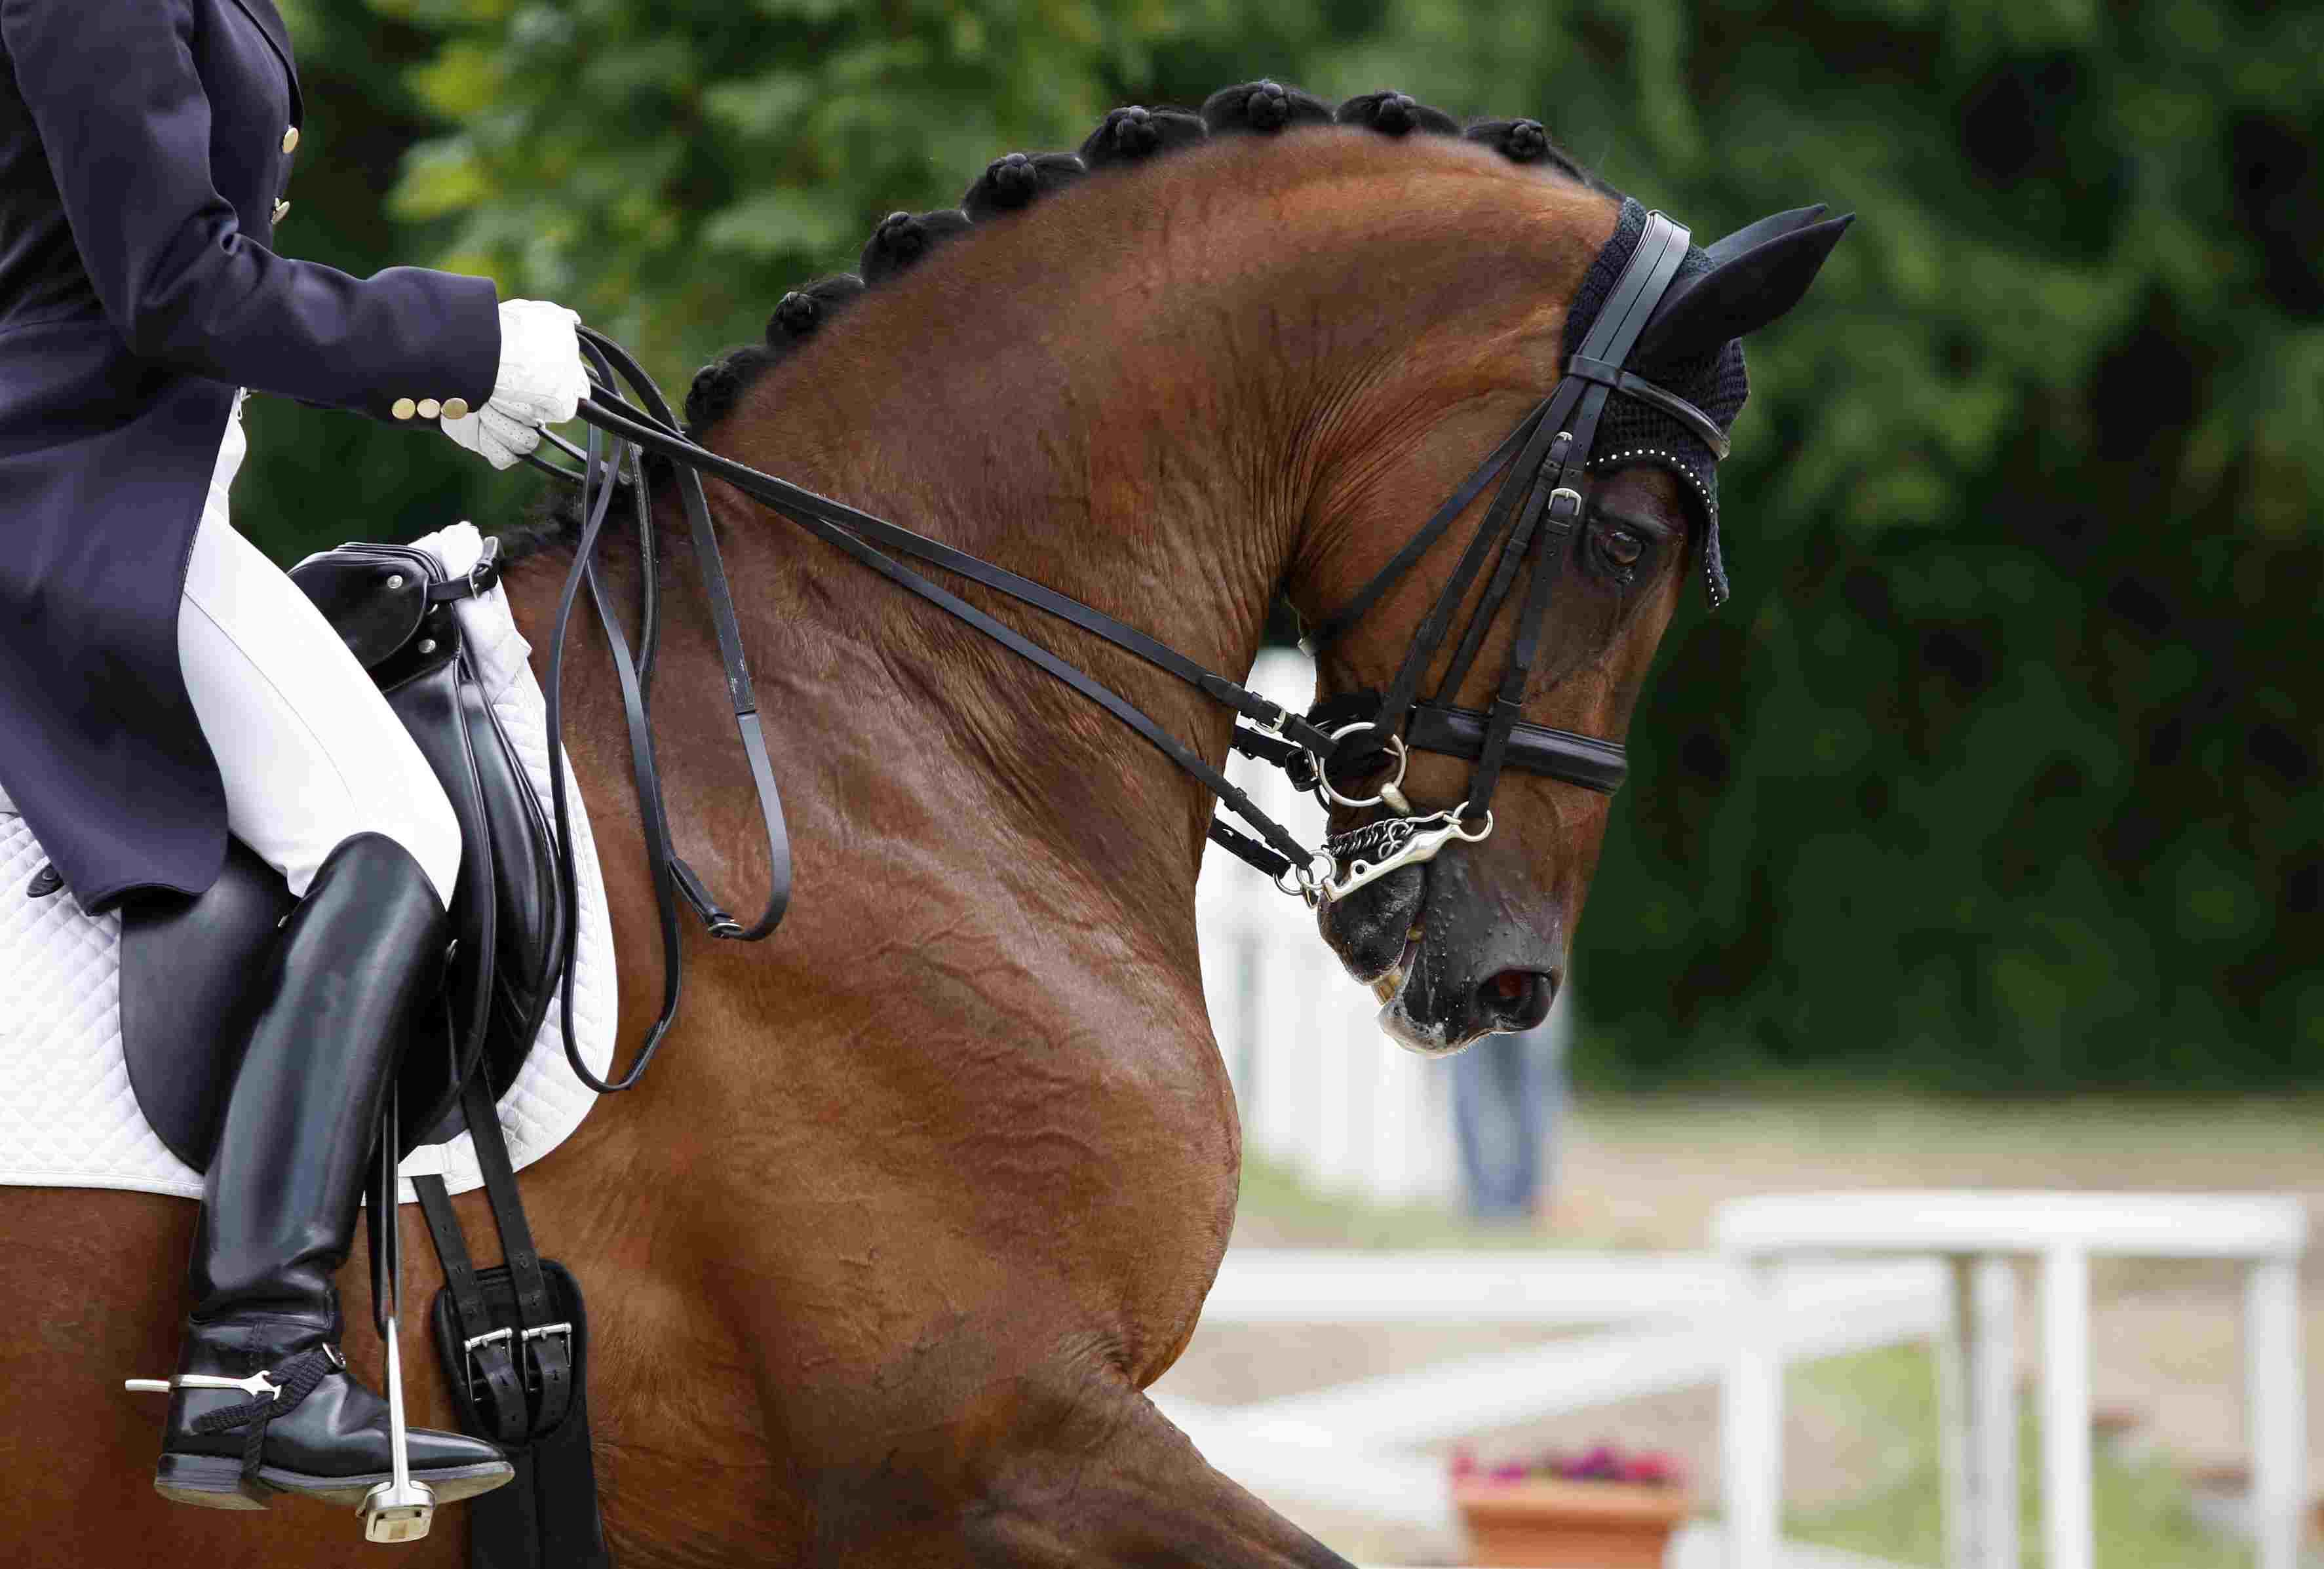 Vista cercana del caballo en una escena de doma